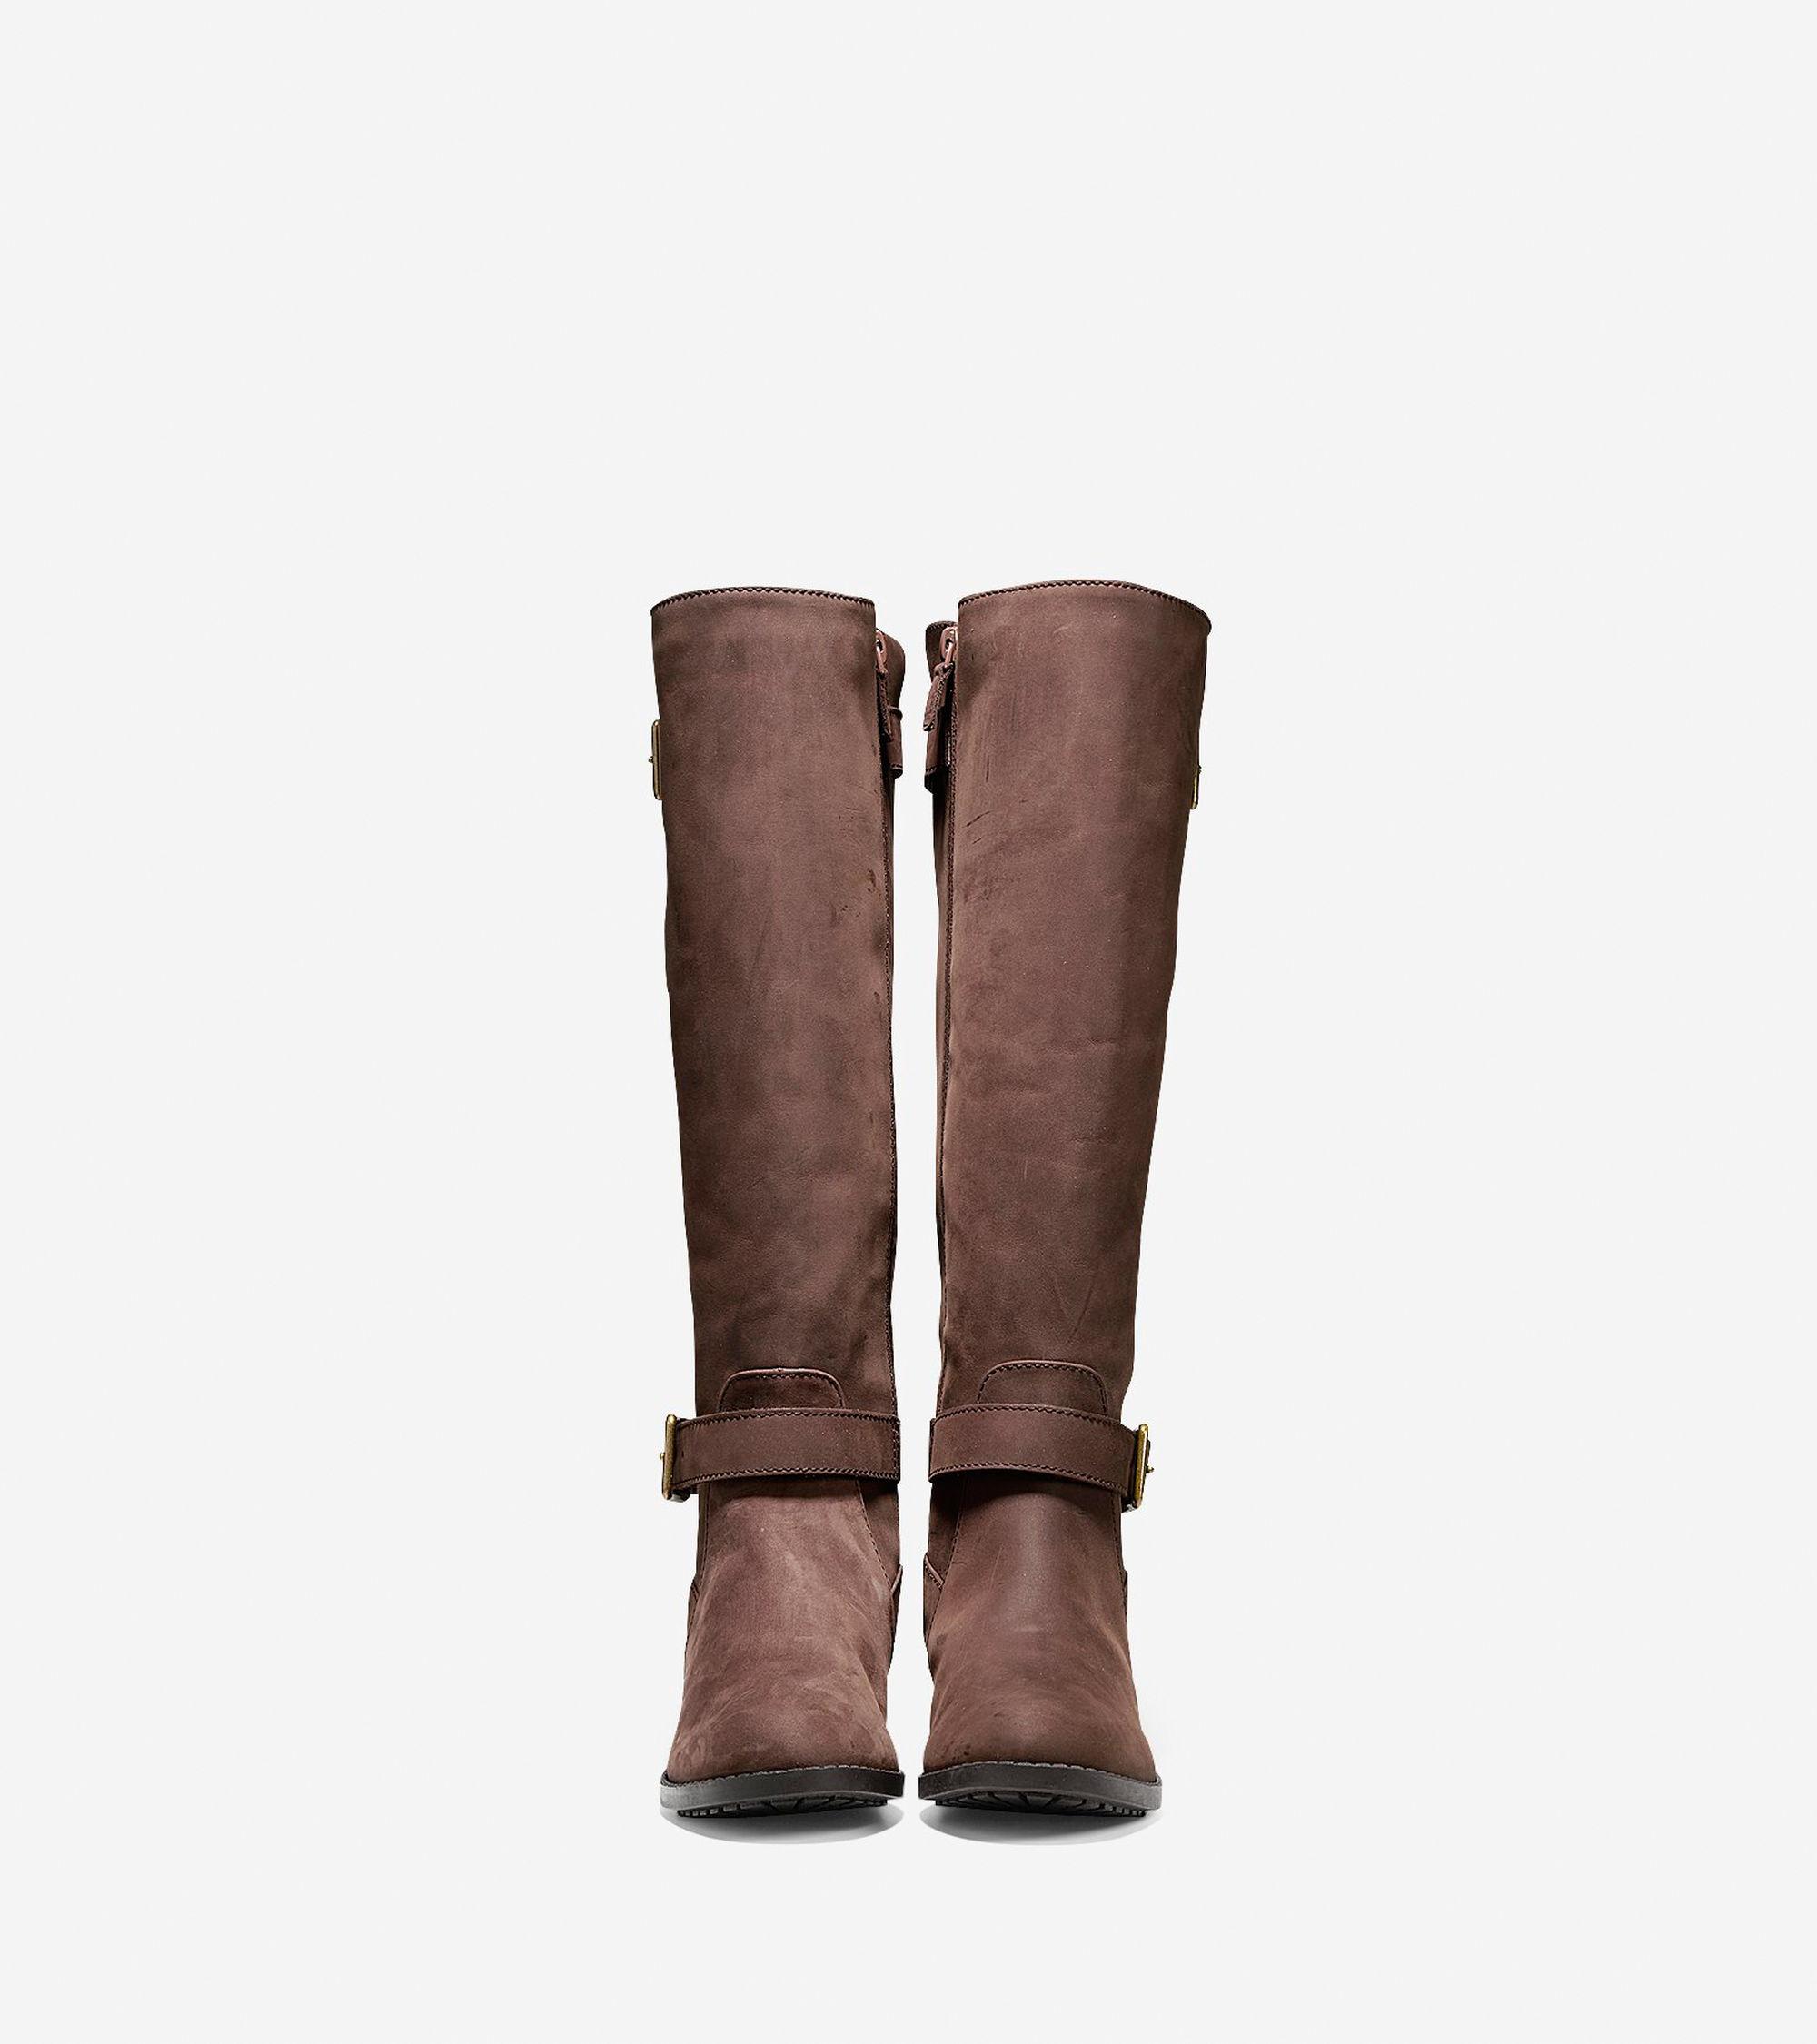 92f1383085d Women's Wide Calf Boots - Shopping Guide - Famous Footwear